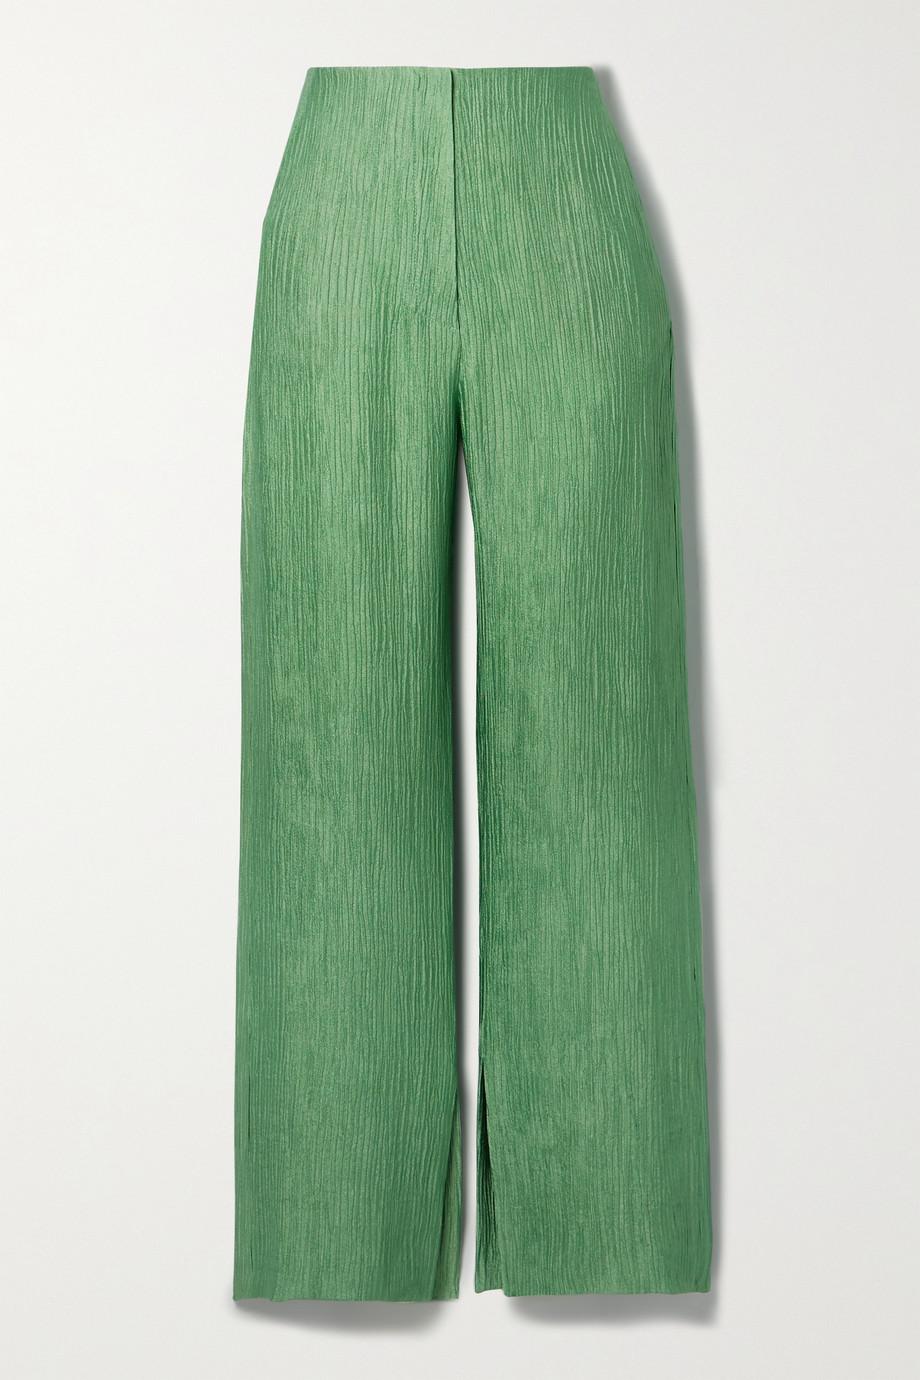 Nanushka Tabbie 金属感细褶绉纱直筒裤